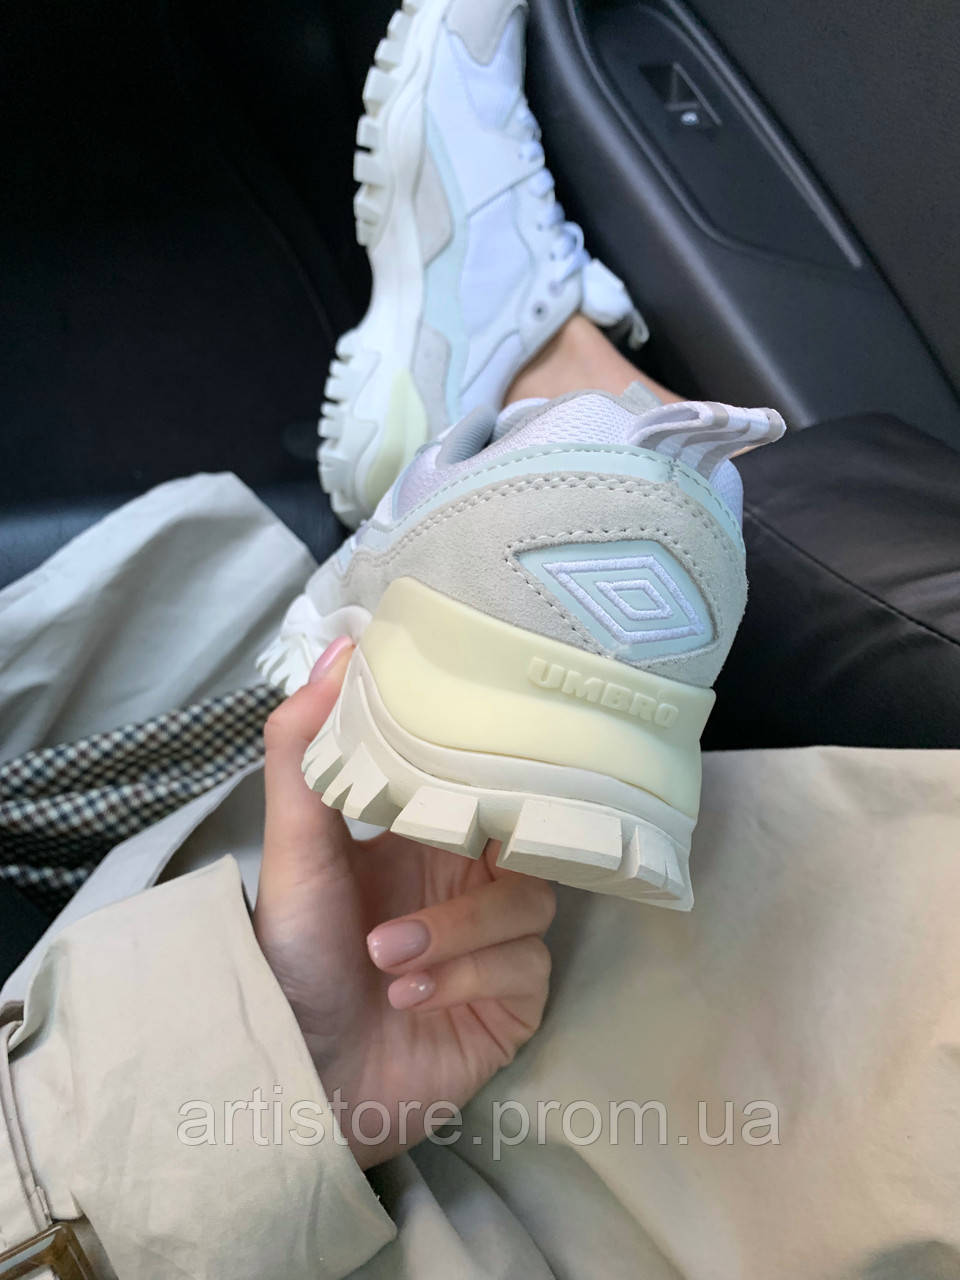 615ed7cd Кроссовки Umbro Bumpy White with grey Белые с серым: продажа, цена в ...